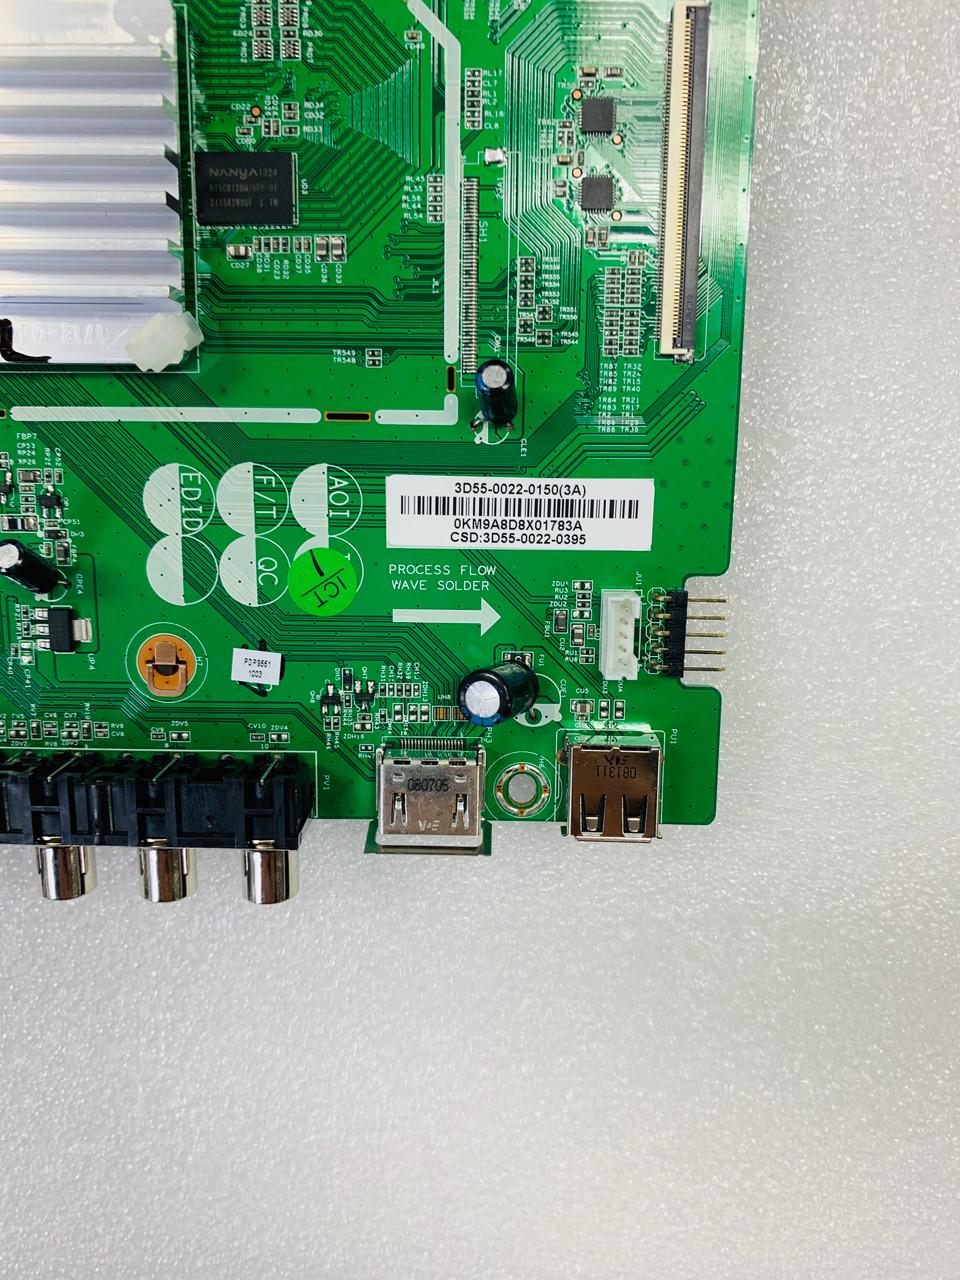 JVC PDPS551 Main board 0171-2271-4973 / 3D55-0022-0150